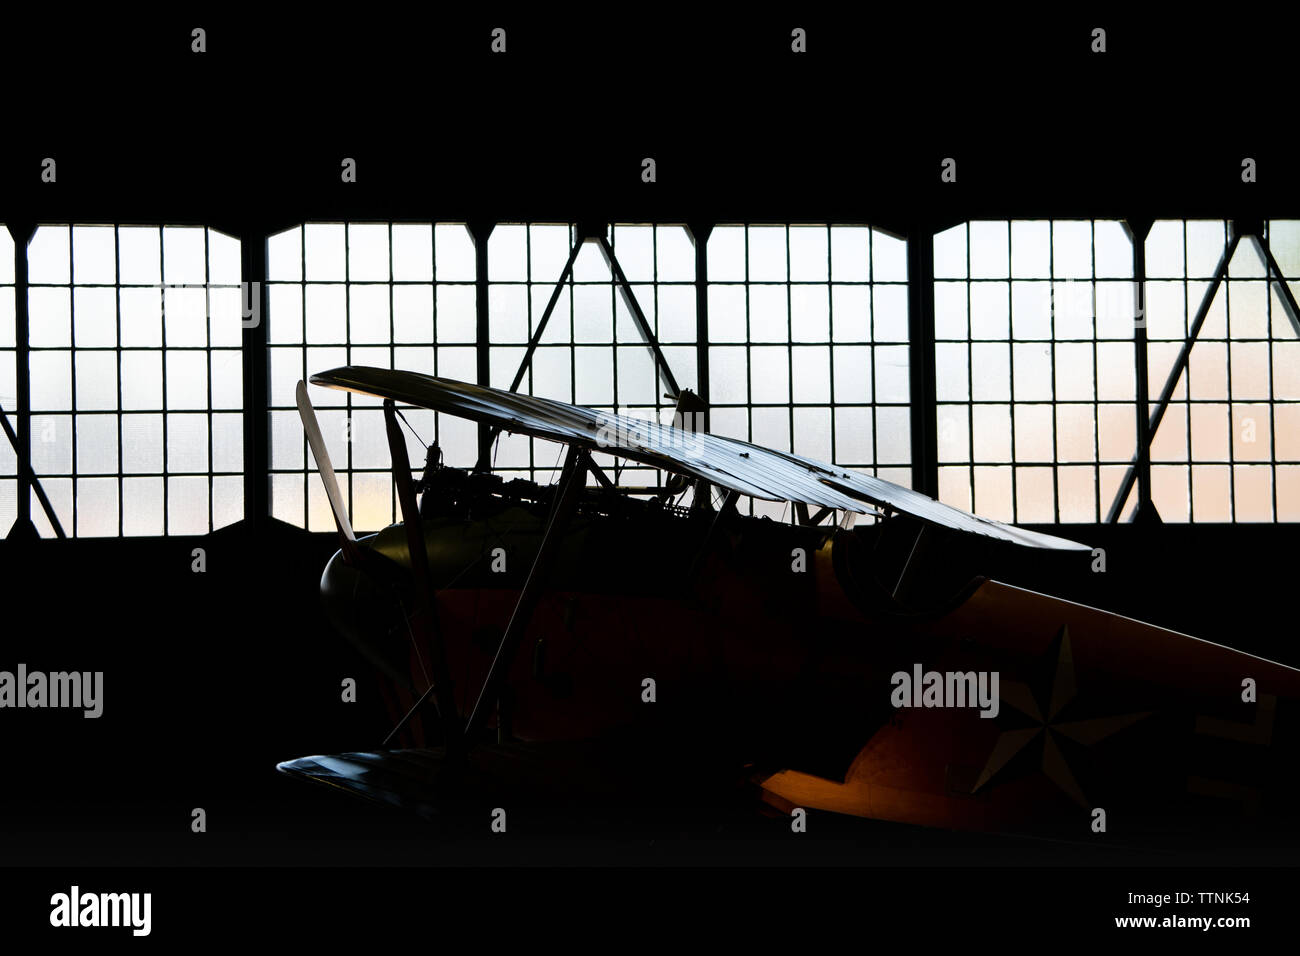 Albatros D.Va replica German Historic WW1 bi-plane silhouette / rim-lit inside a hangar. As flown by the Red Baron, Manfred von Richthofen - Stock Image